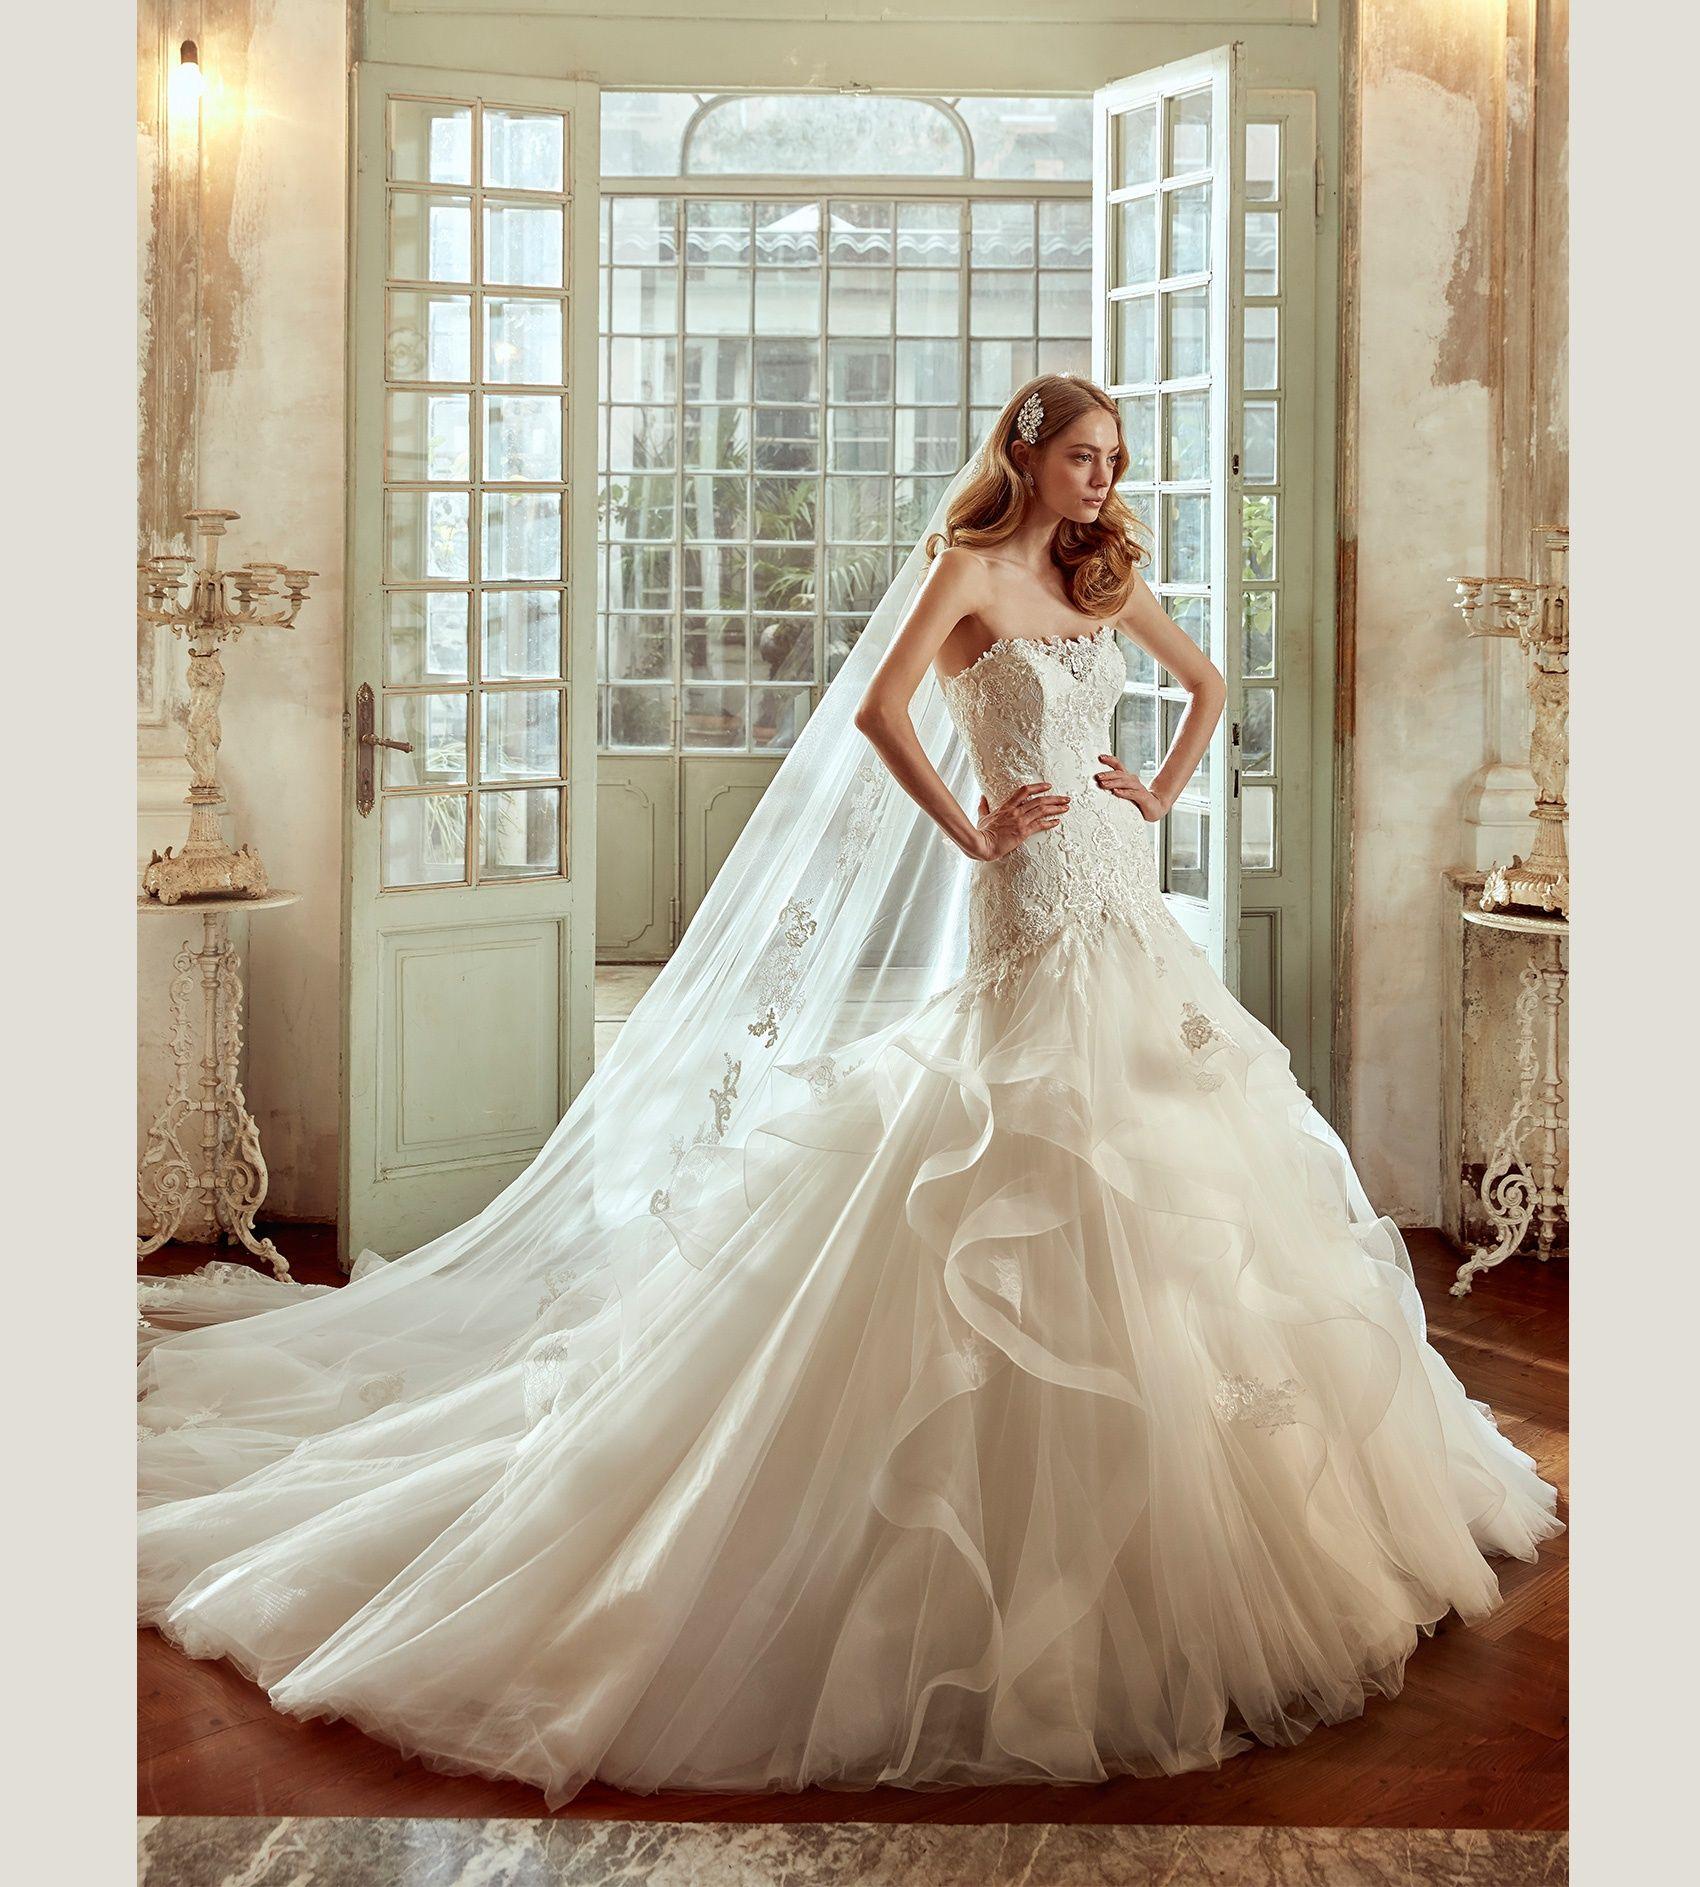 Designer wedding gowns designernicoleweddingdresses